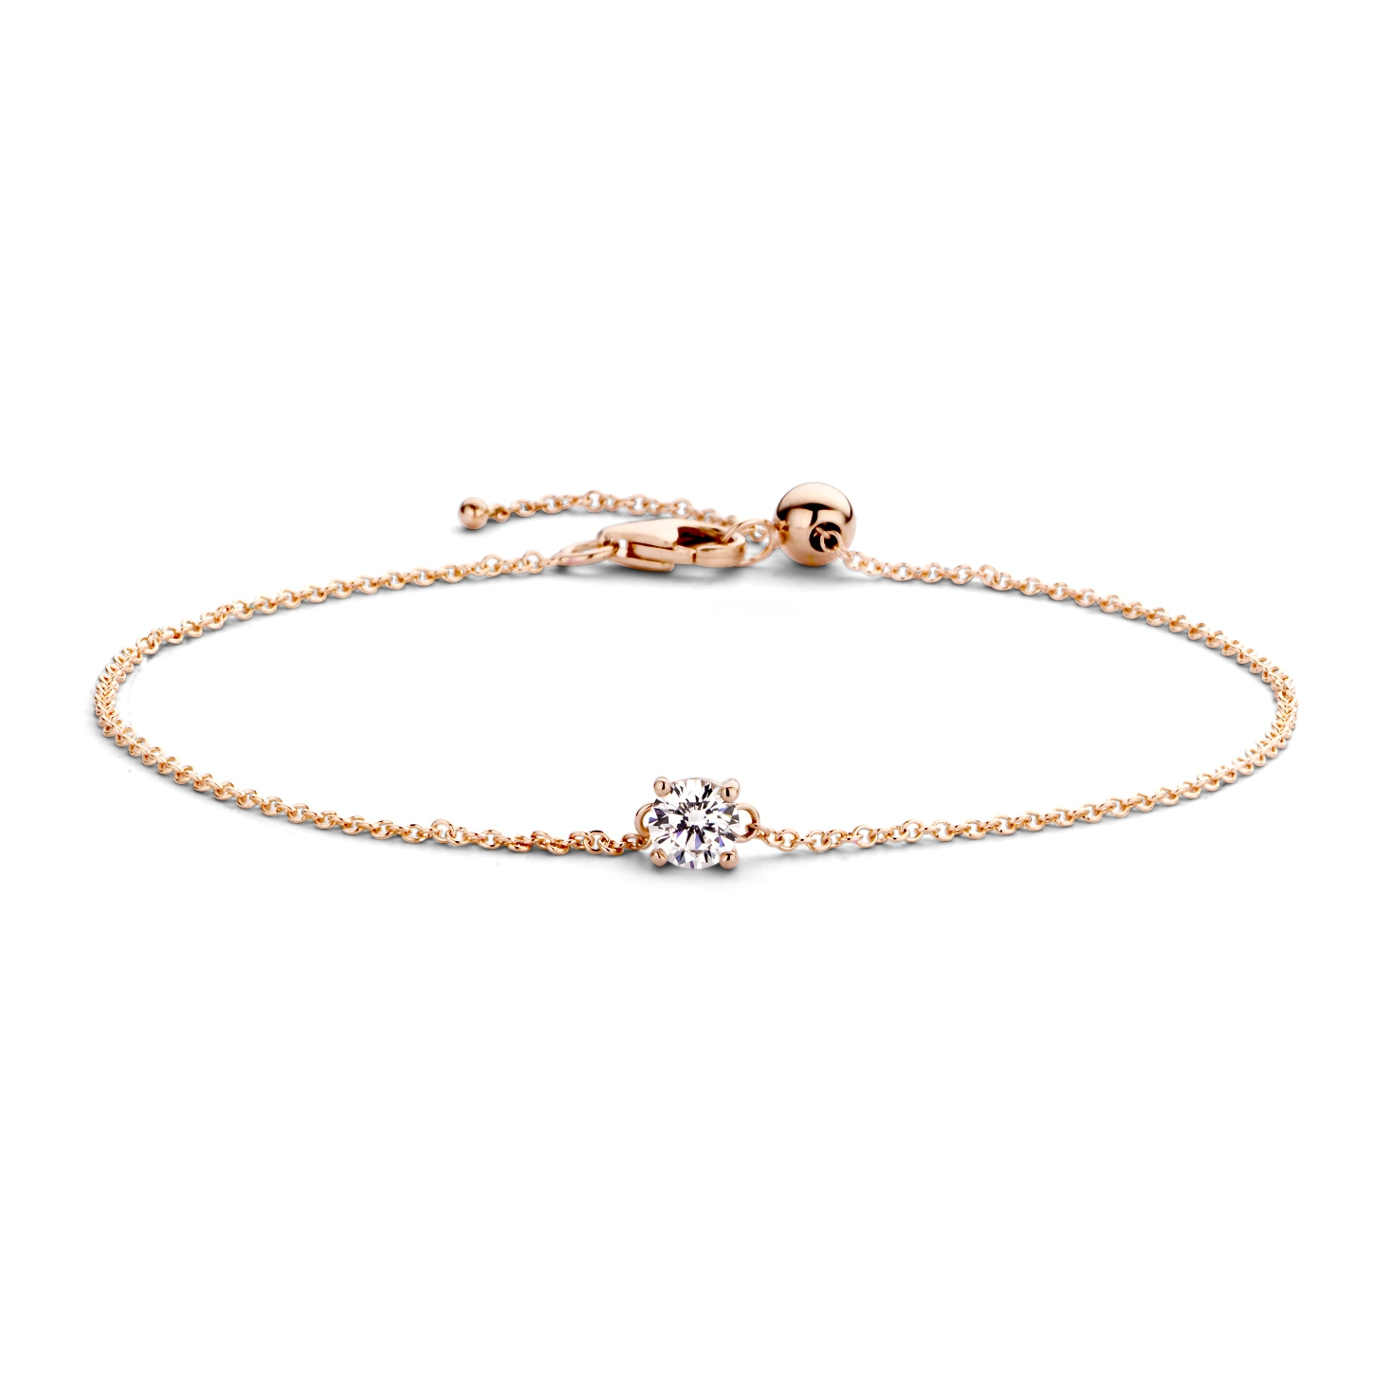 Bilde av Blush bracelet 2166RZI (Size: 18 cm)